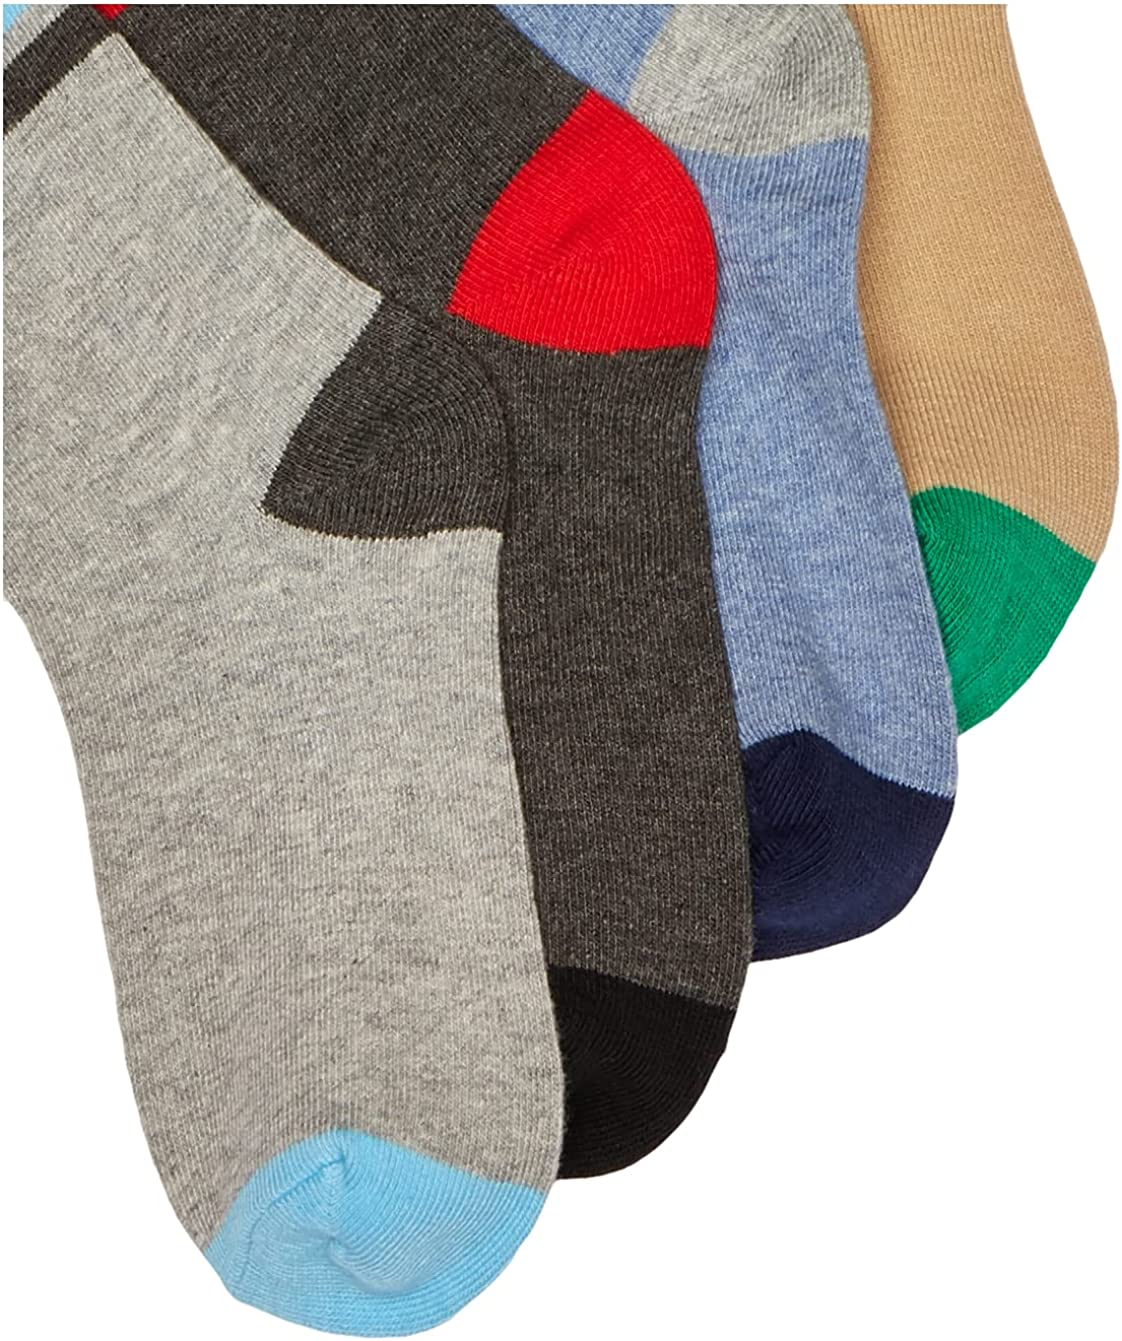 Jefferies Socks Big Boys' Stripe Crew Socks 6 Pack, Multi Size